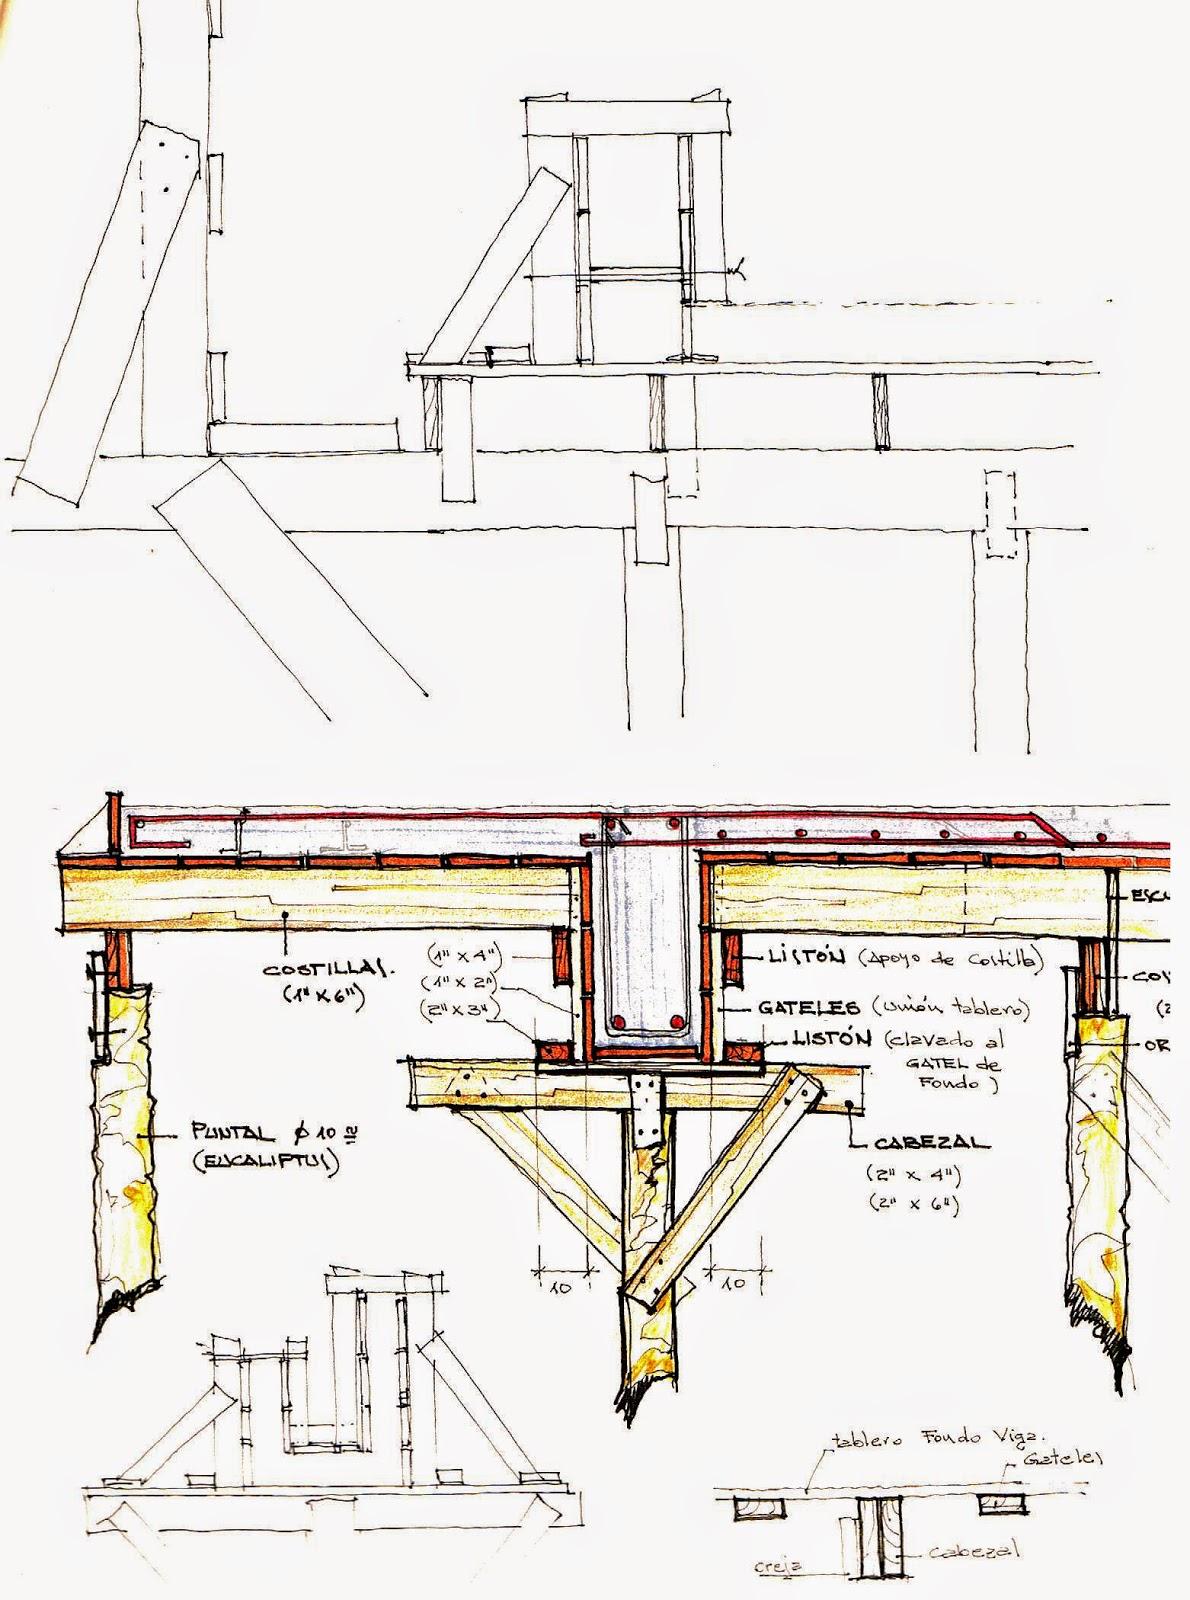 Proceso de obra arquitecto roque e paulino for Detalle escalera volada